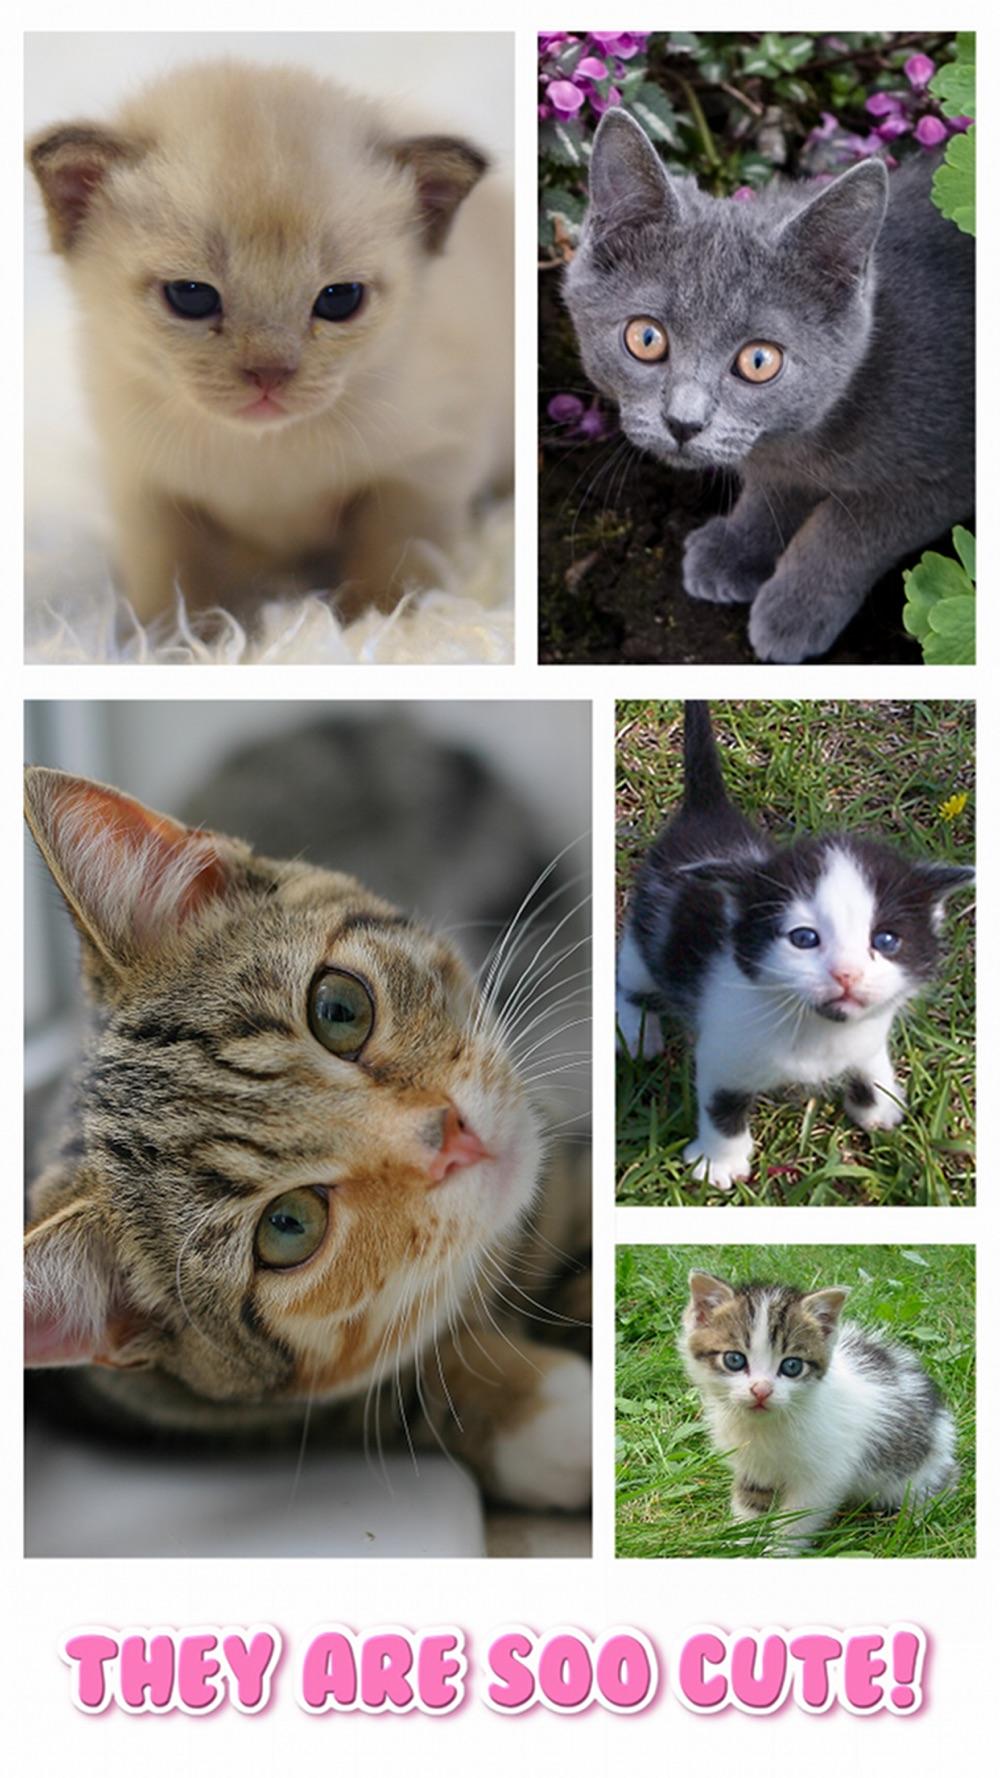 Cat Kitten Jigsaw Puzzle Games hack tool